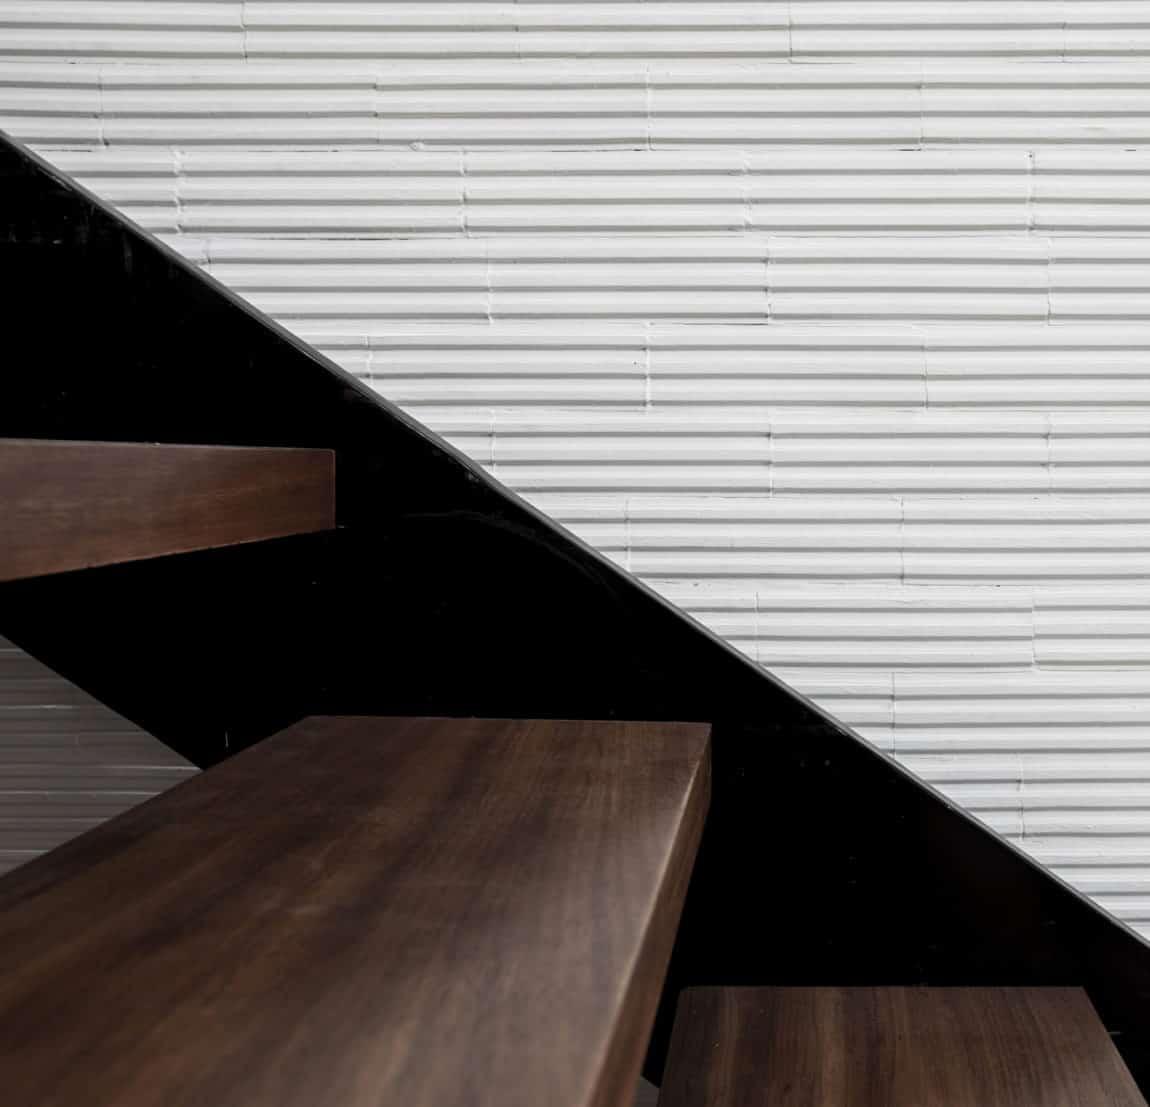 7x18 by AHL architects associates (3)